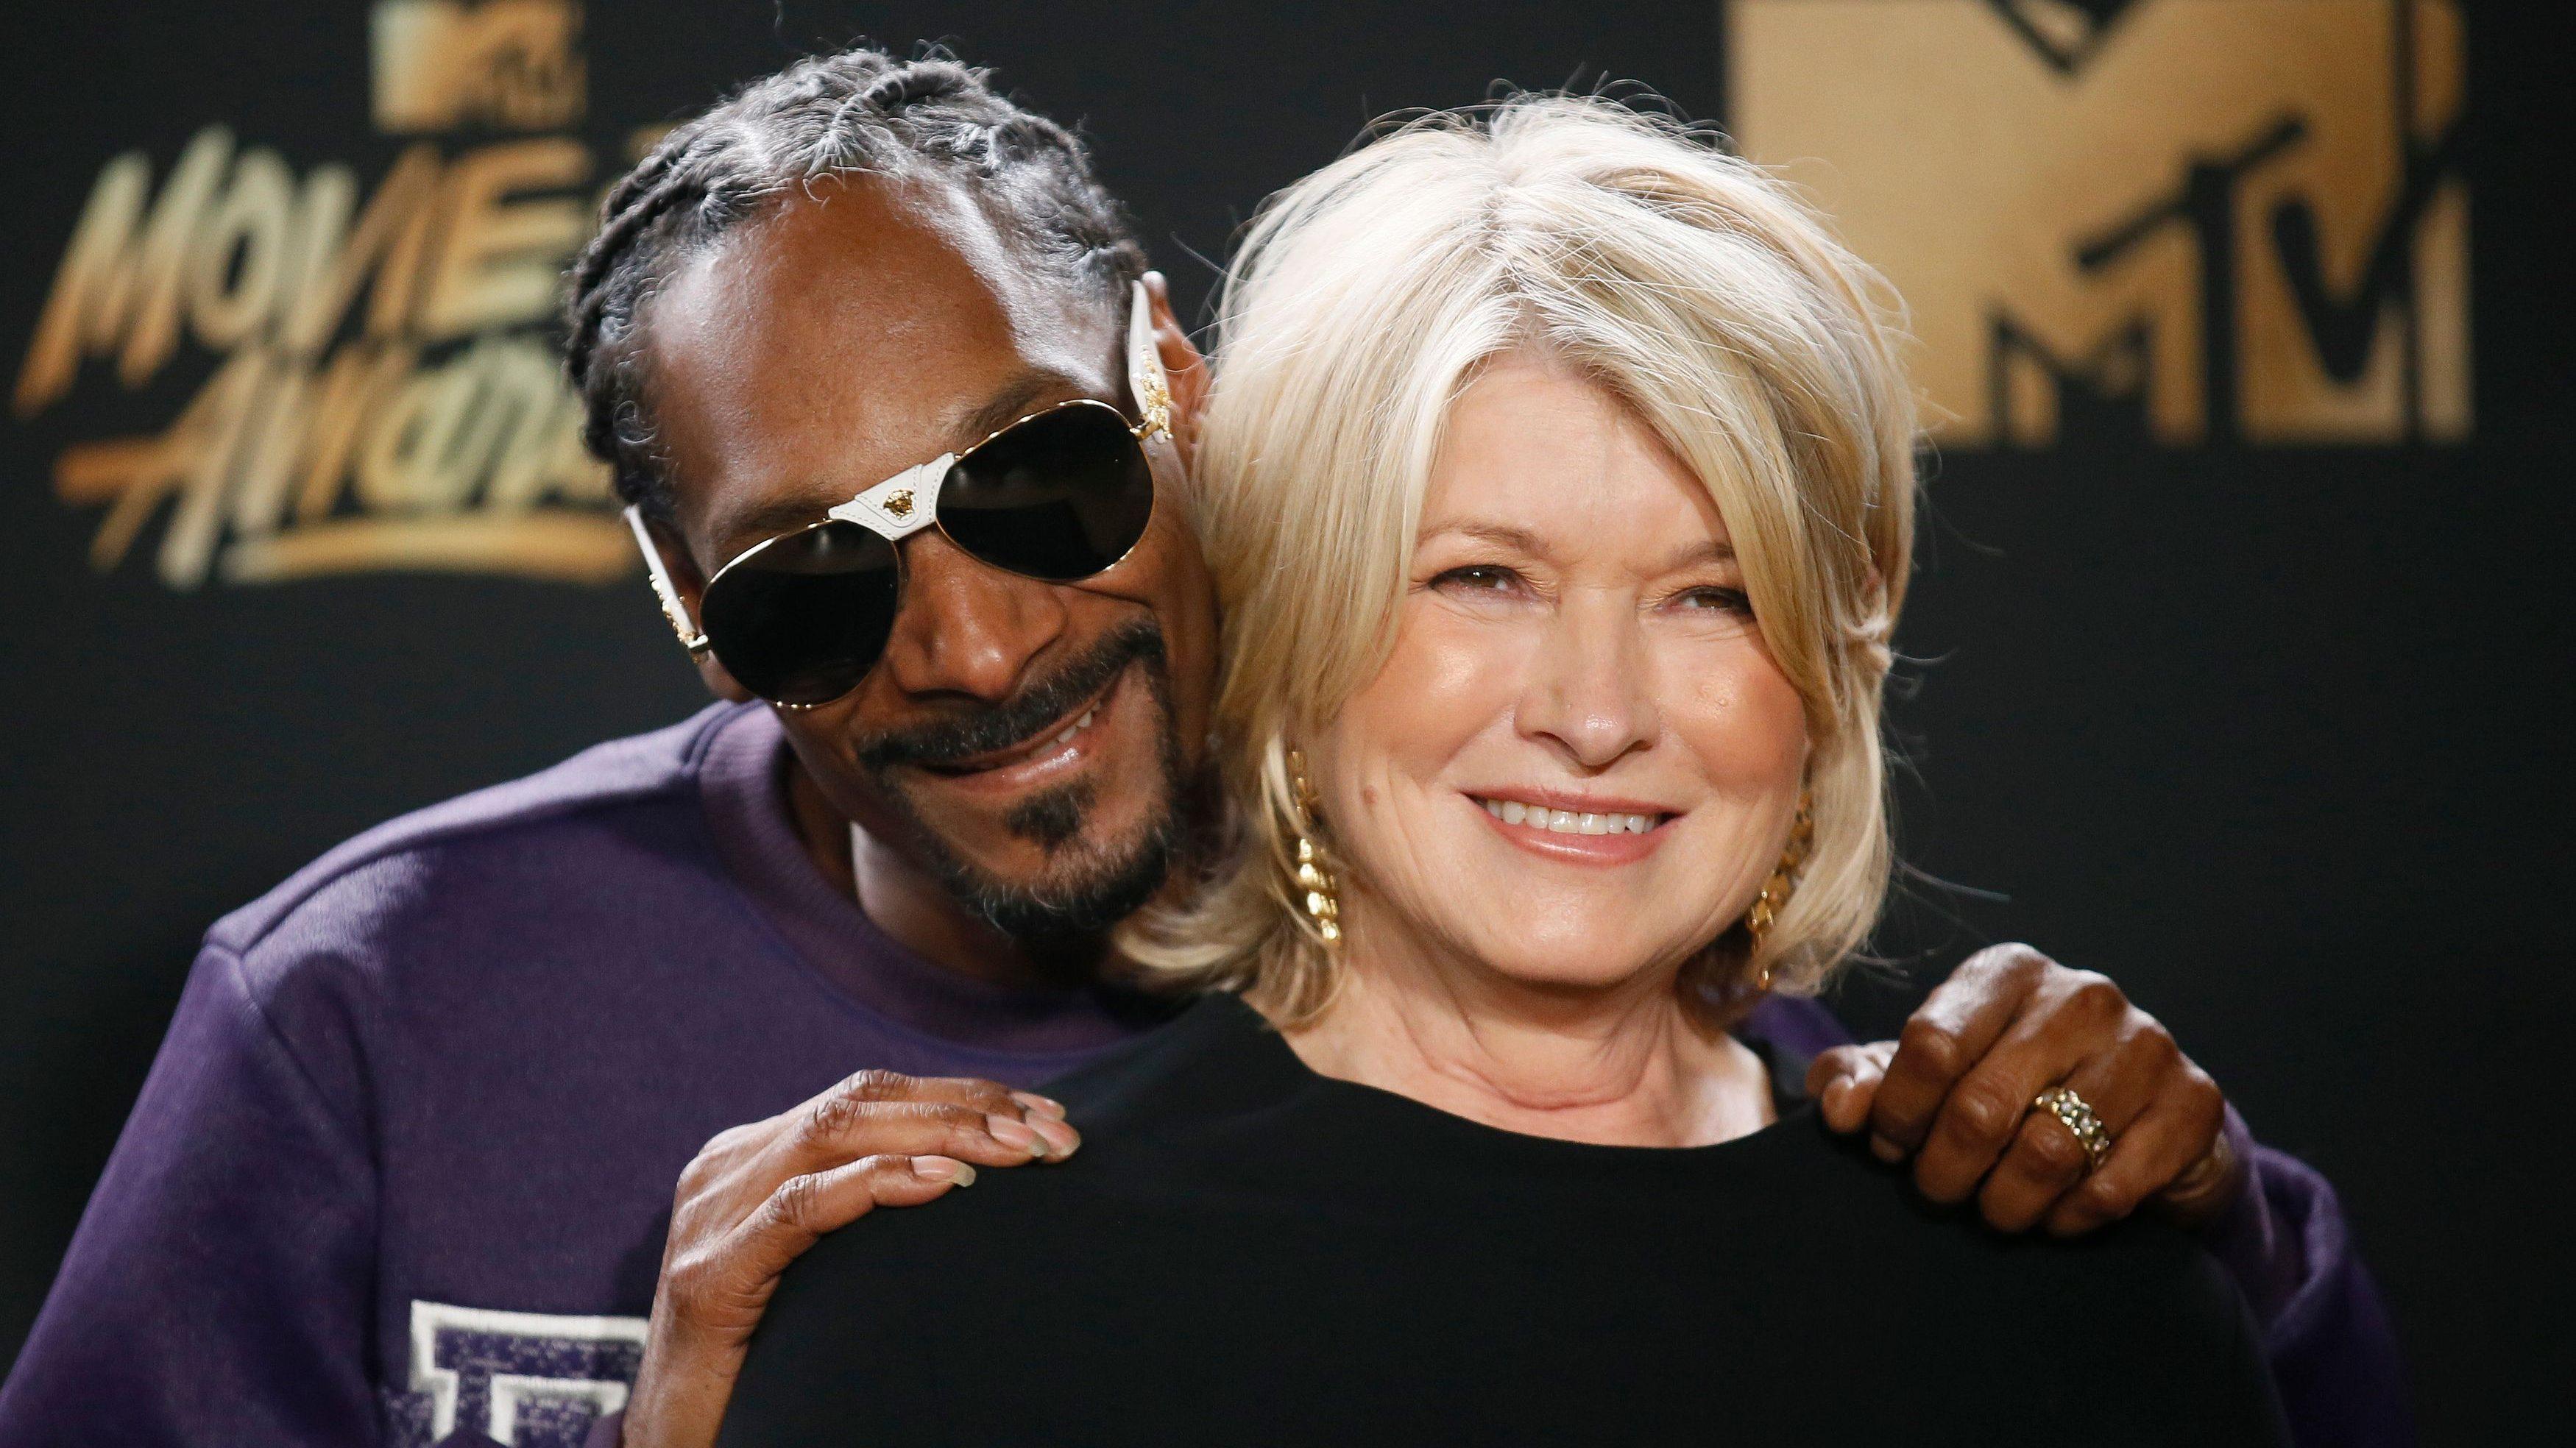 2017 MTV Movie and TV Awards – Photo Room – Los Angeles, U.S., 07/05/2017 – Snoop Dogg and Martha Stewart. REUTERS/Danny Moloshok - HP1ED58061CHG